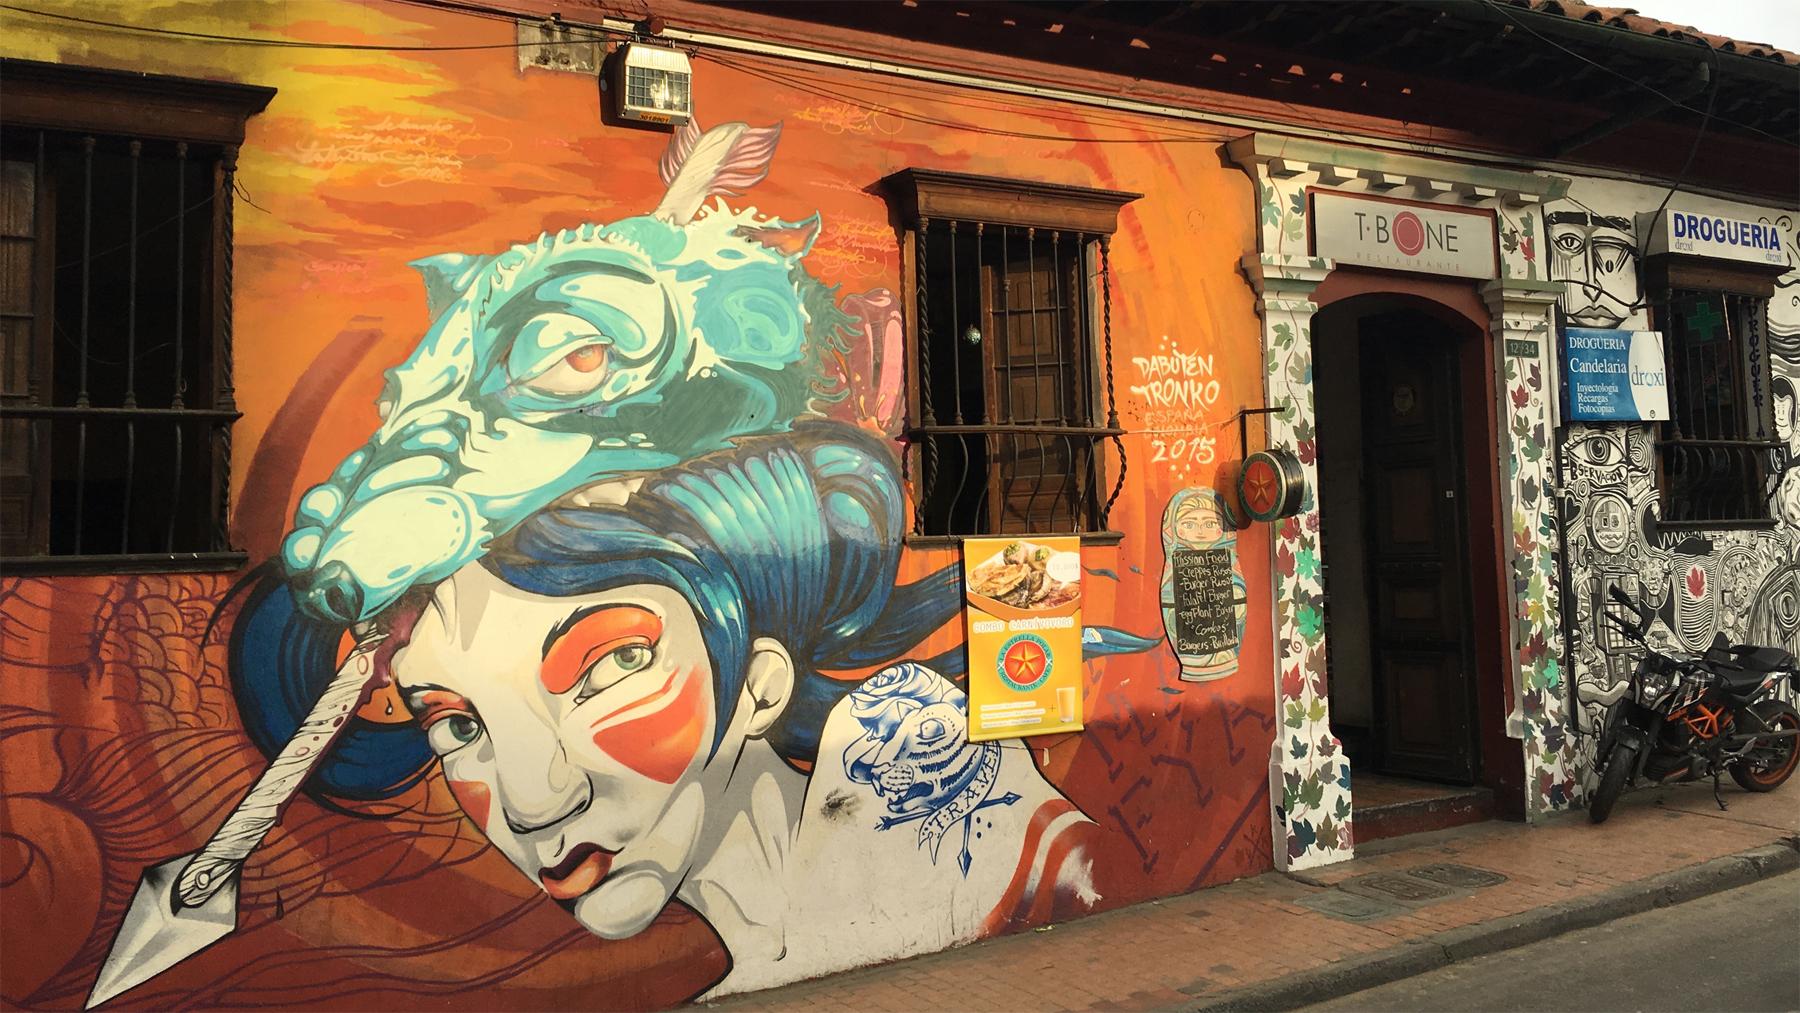 Dabuten Tronko's murals often feature strong characterizations of women.